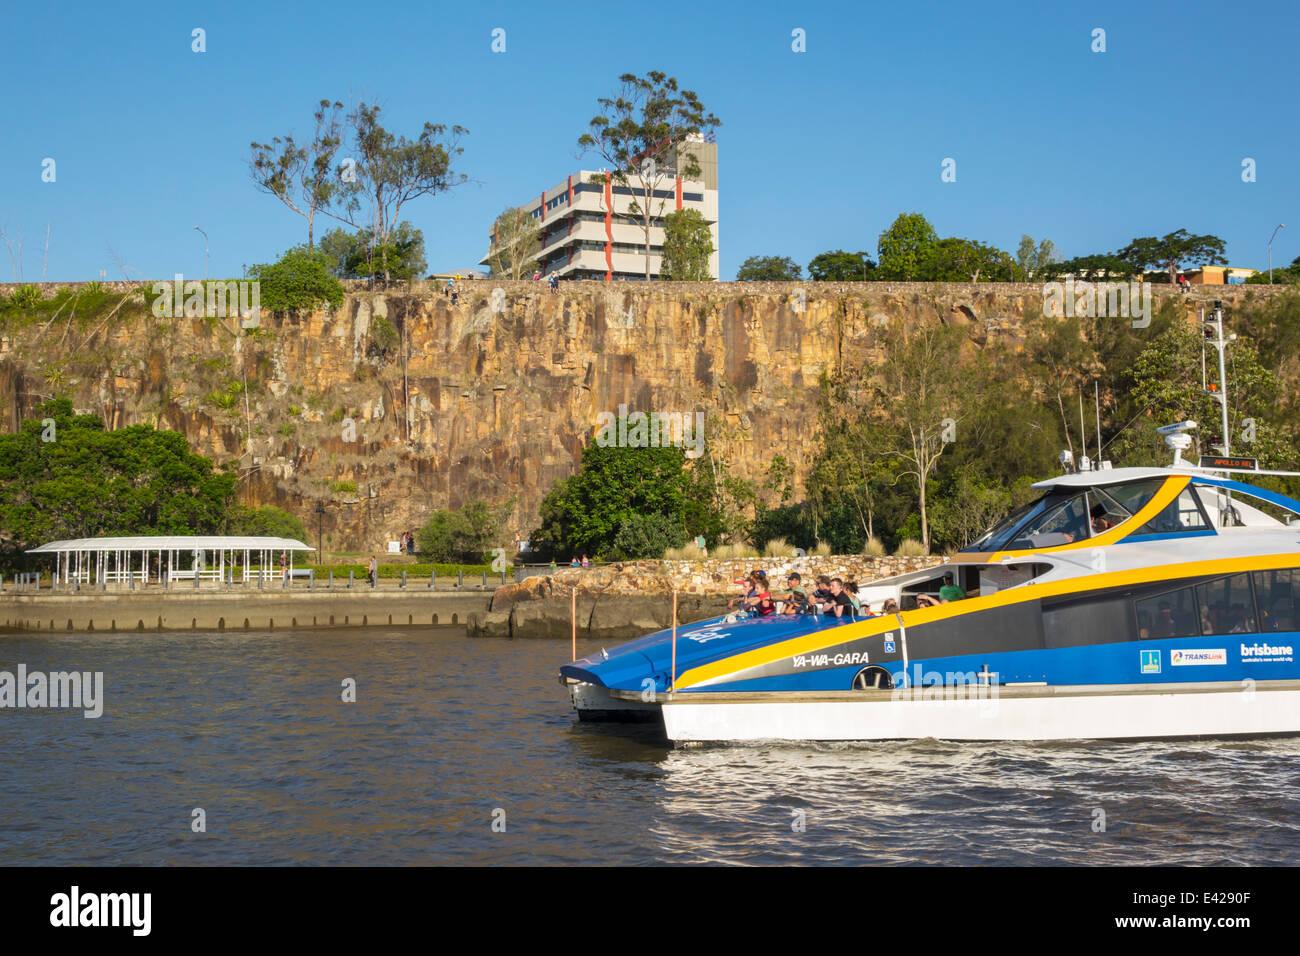 Brisbane Australia Queensland Kangaroo Point Cliffs Brisbane River CityCat ferry boat public transportation riders - Stock Image